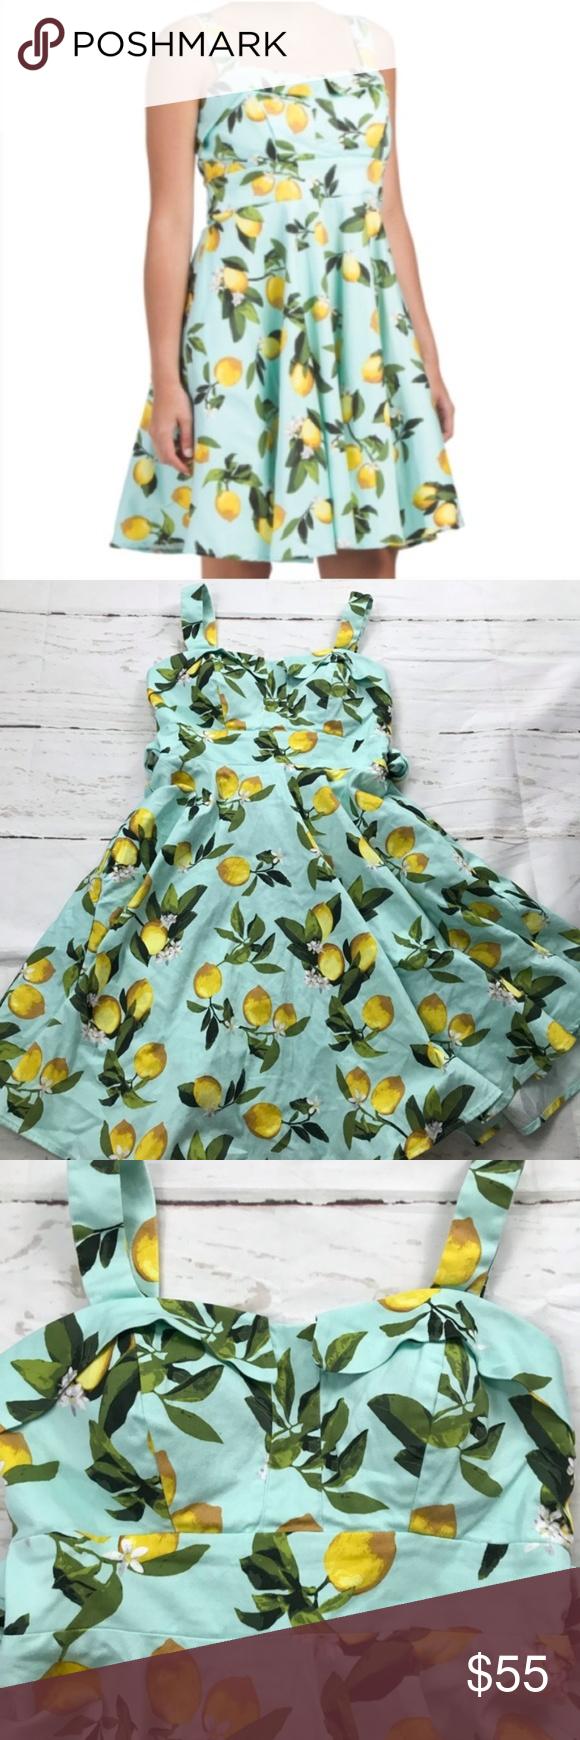 31+ Chetta b pineapple dress inspirations